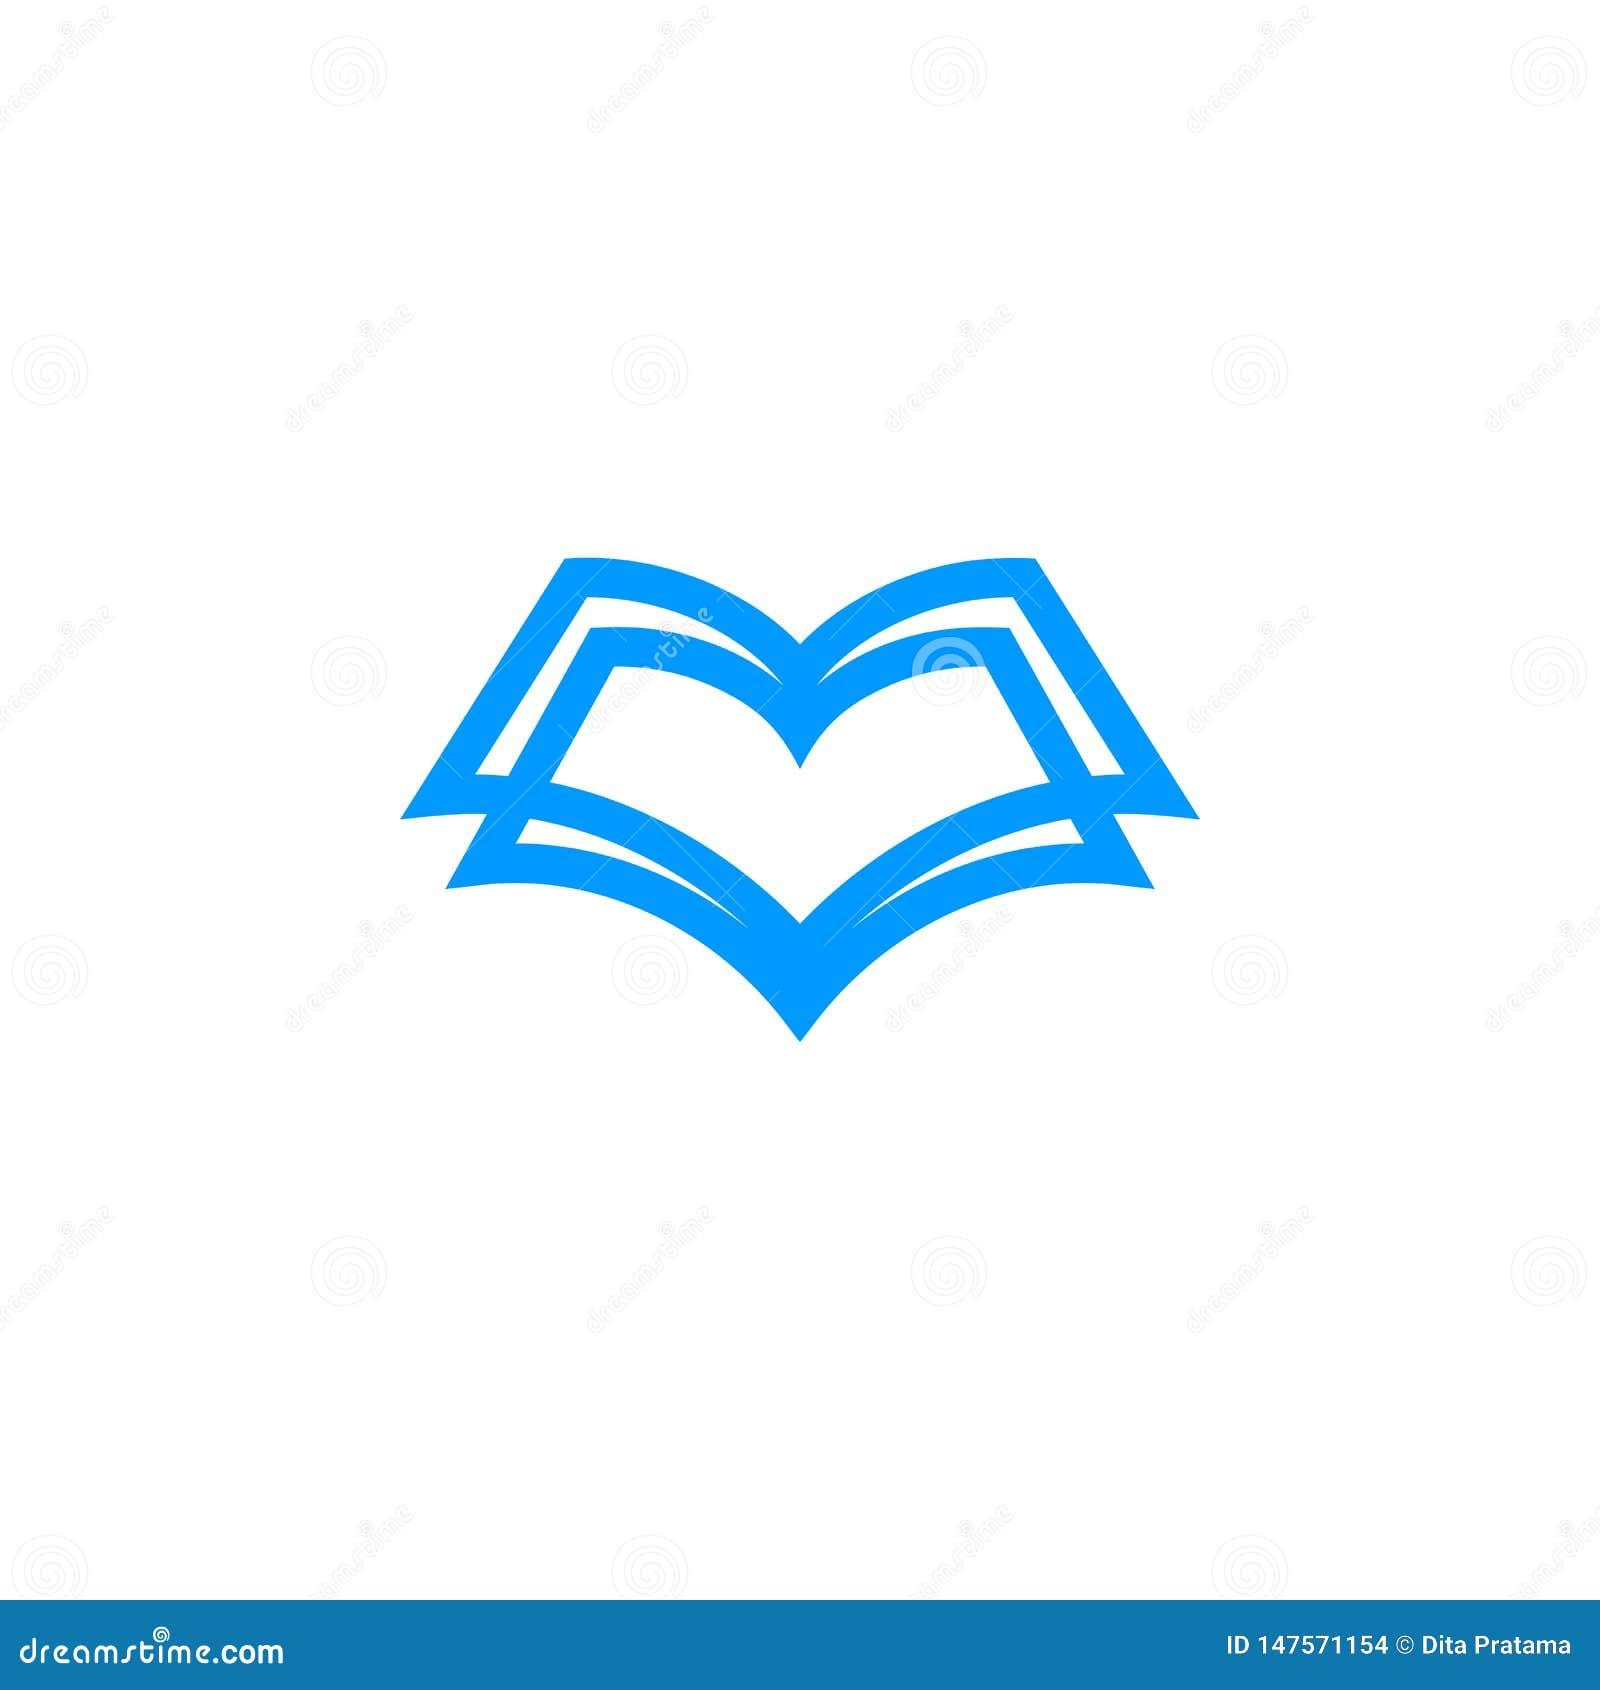 Einzigartiges Formbuchlogo